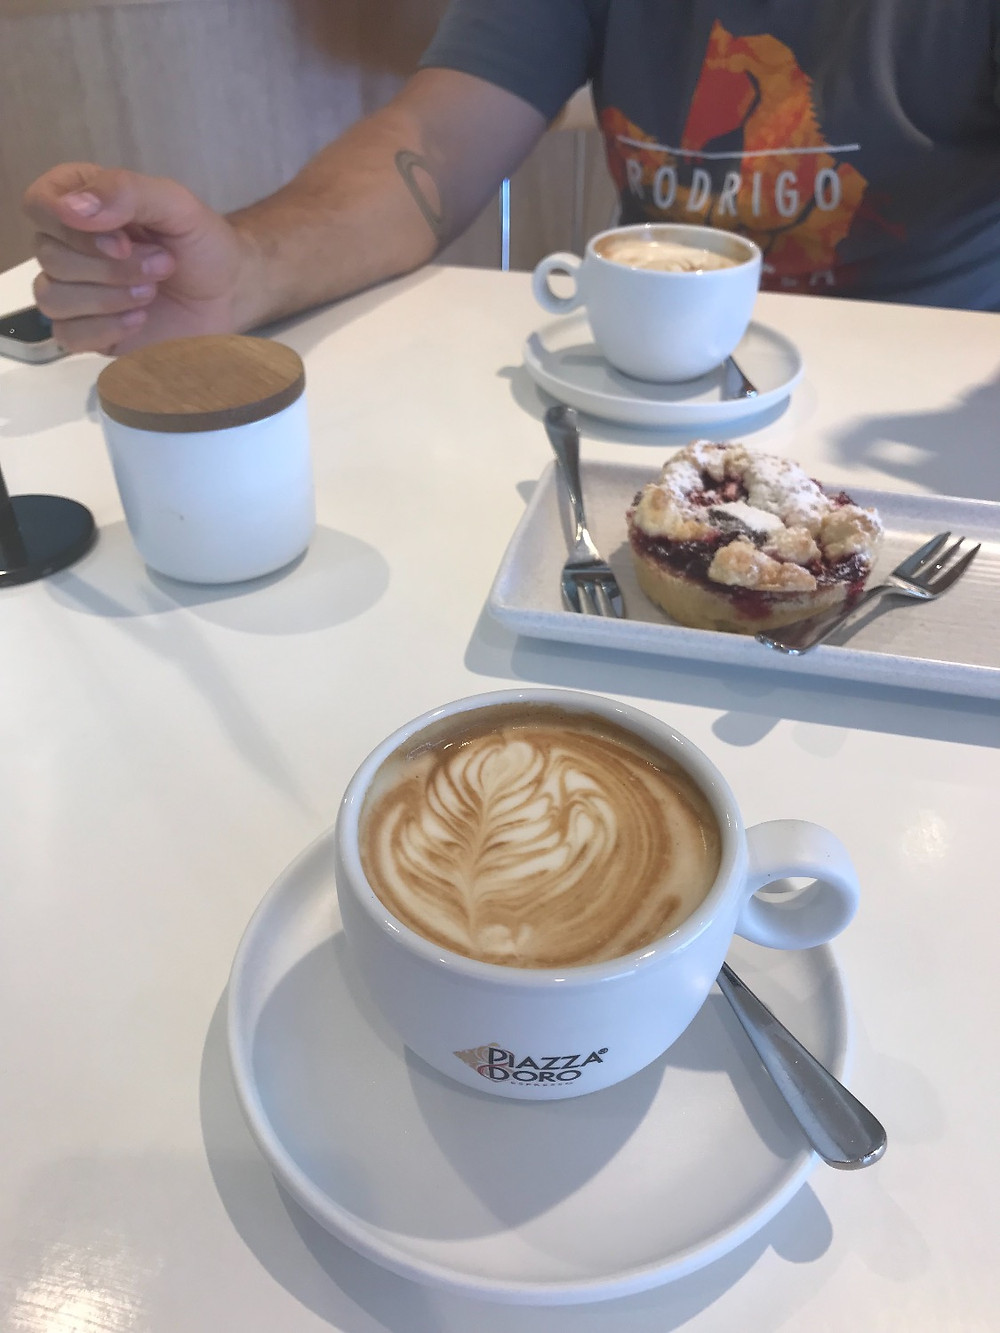 Vegan friendly coffee and cake